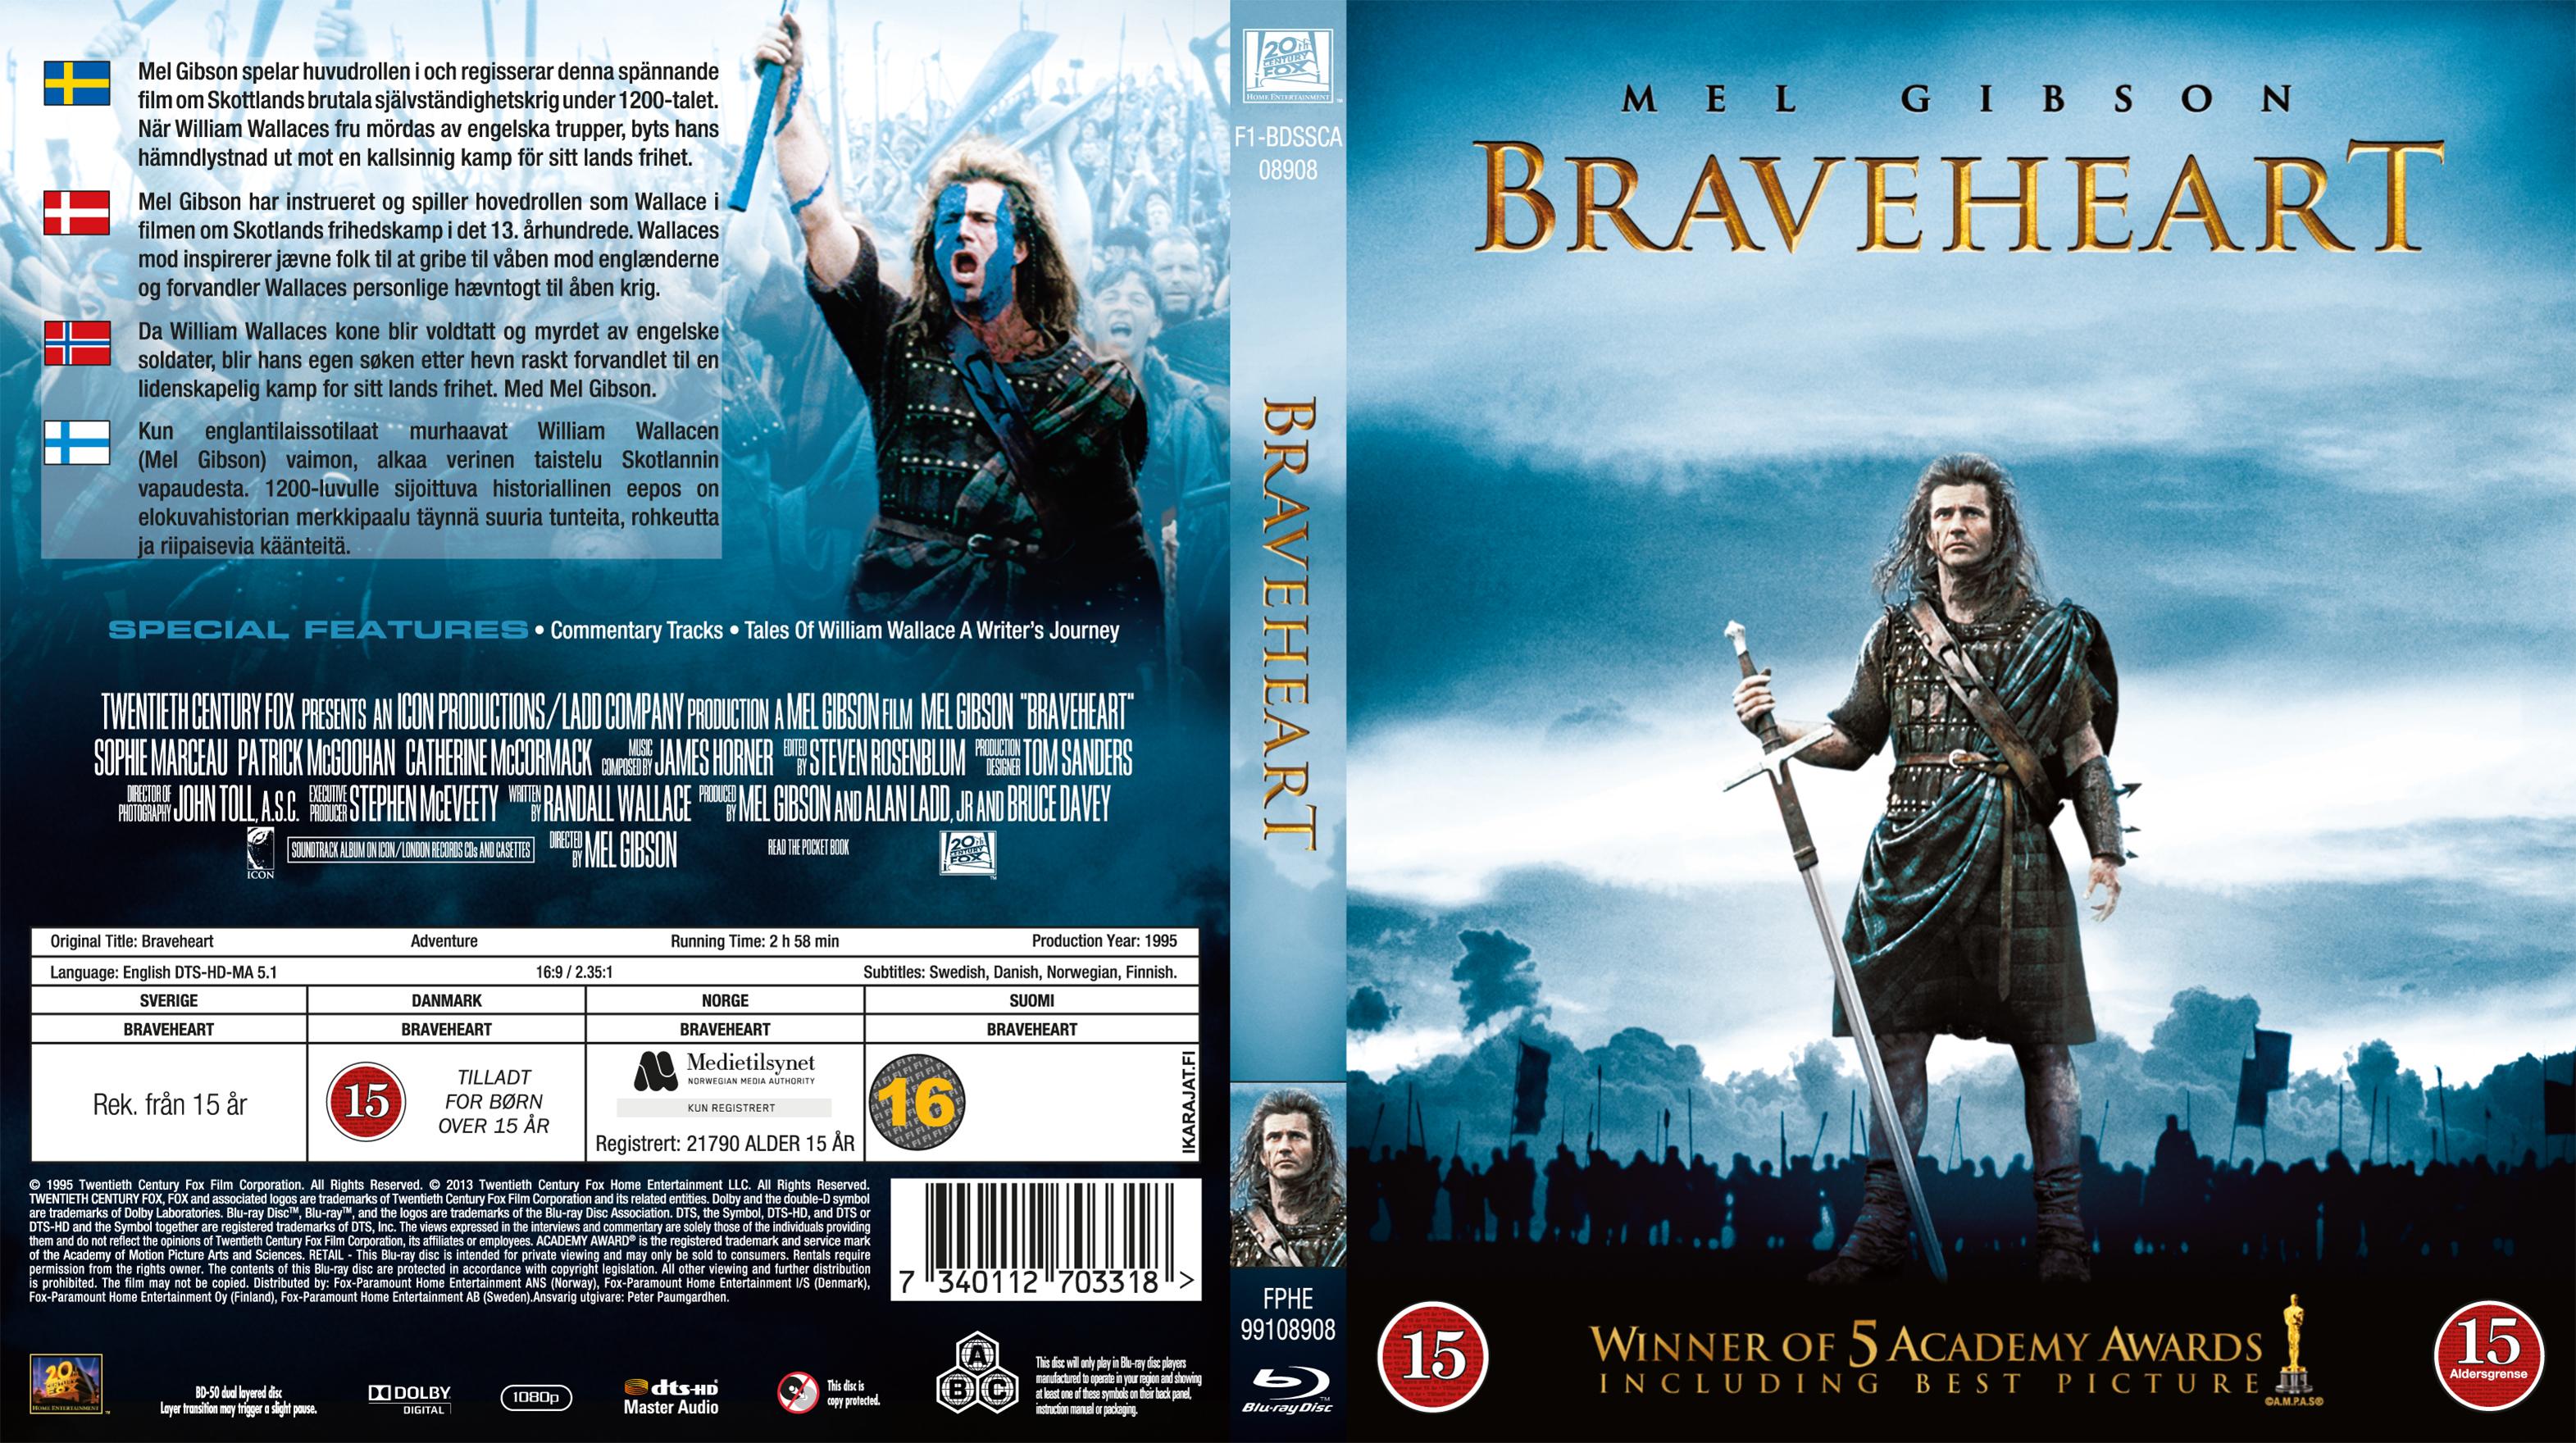 Covers Box Sk Braveheart 1995 Blu Ray Nordic High Quality Dvd Blueray Movie